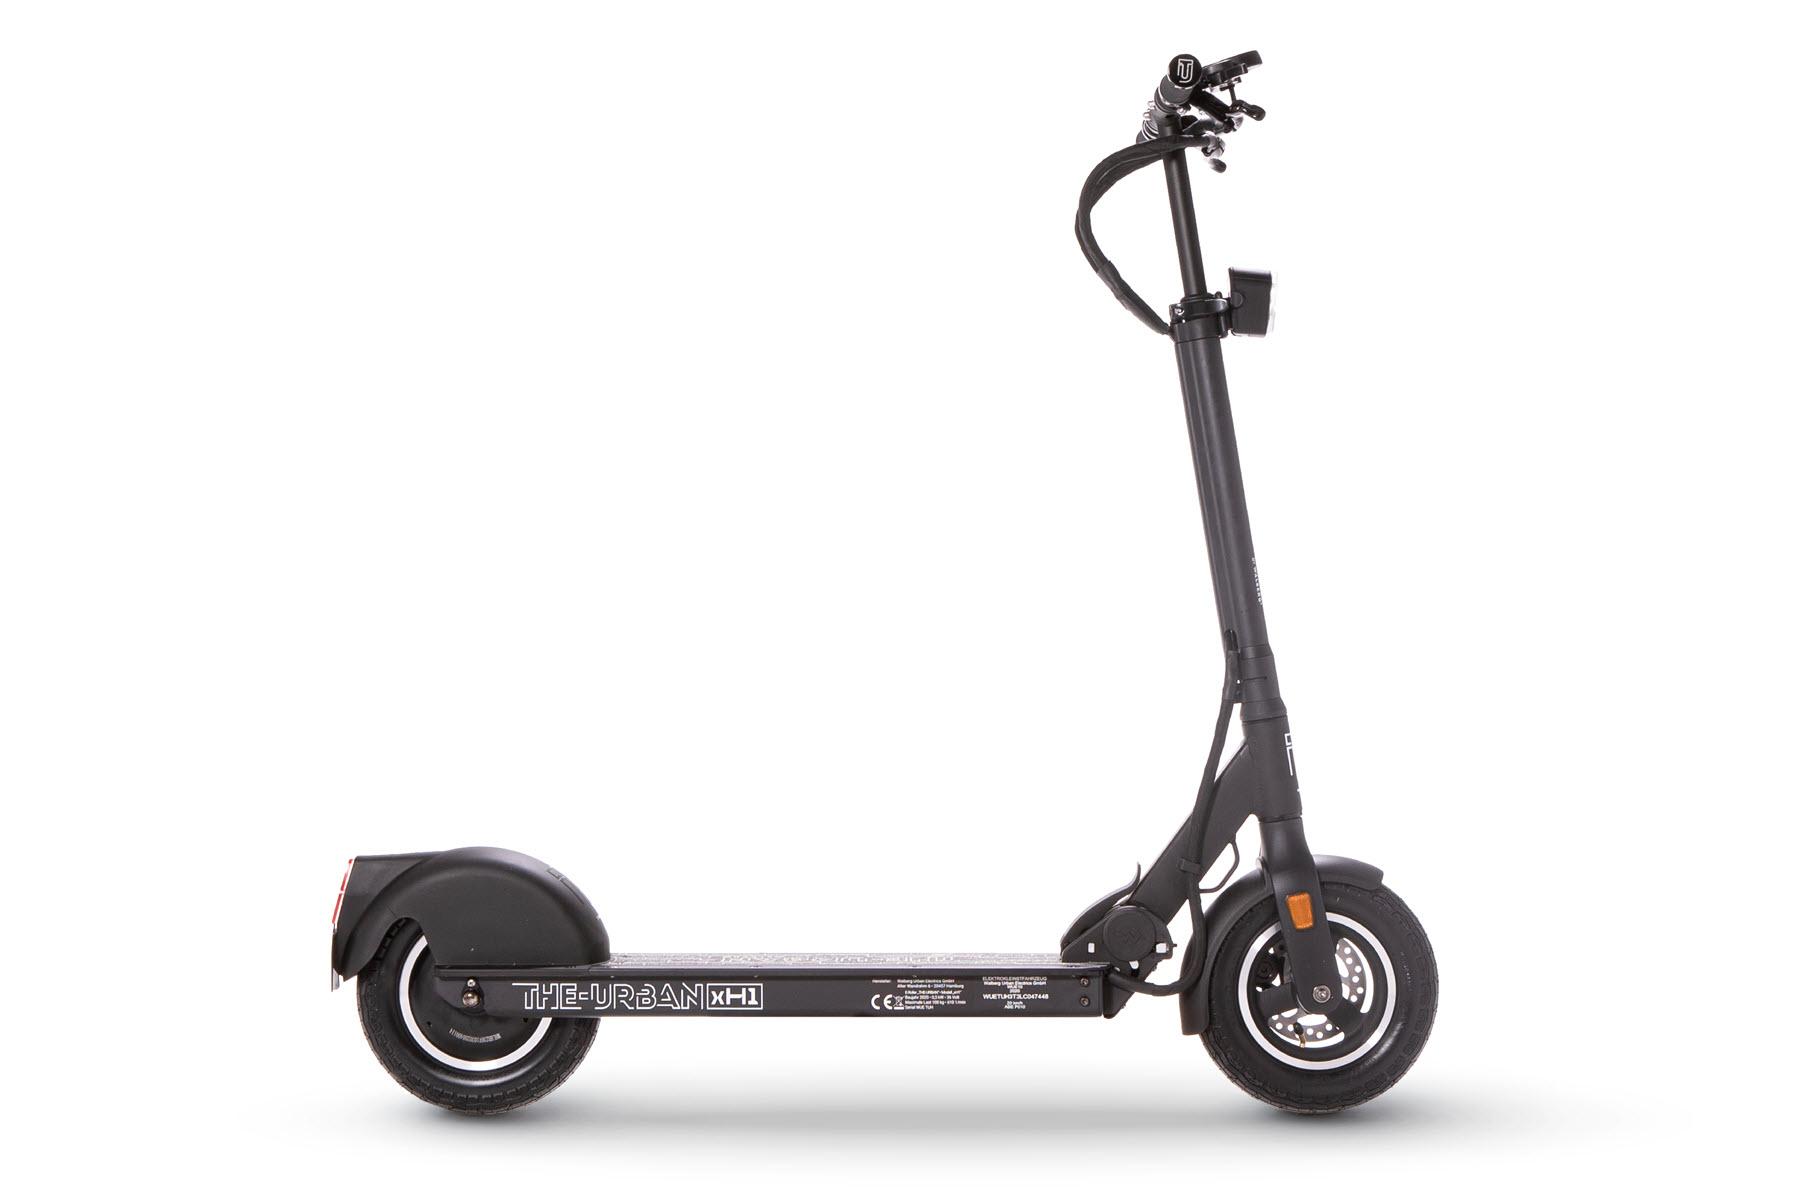 E-Scooter THE-URBAN xH1 mit Straßenzulassung nach eKFV